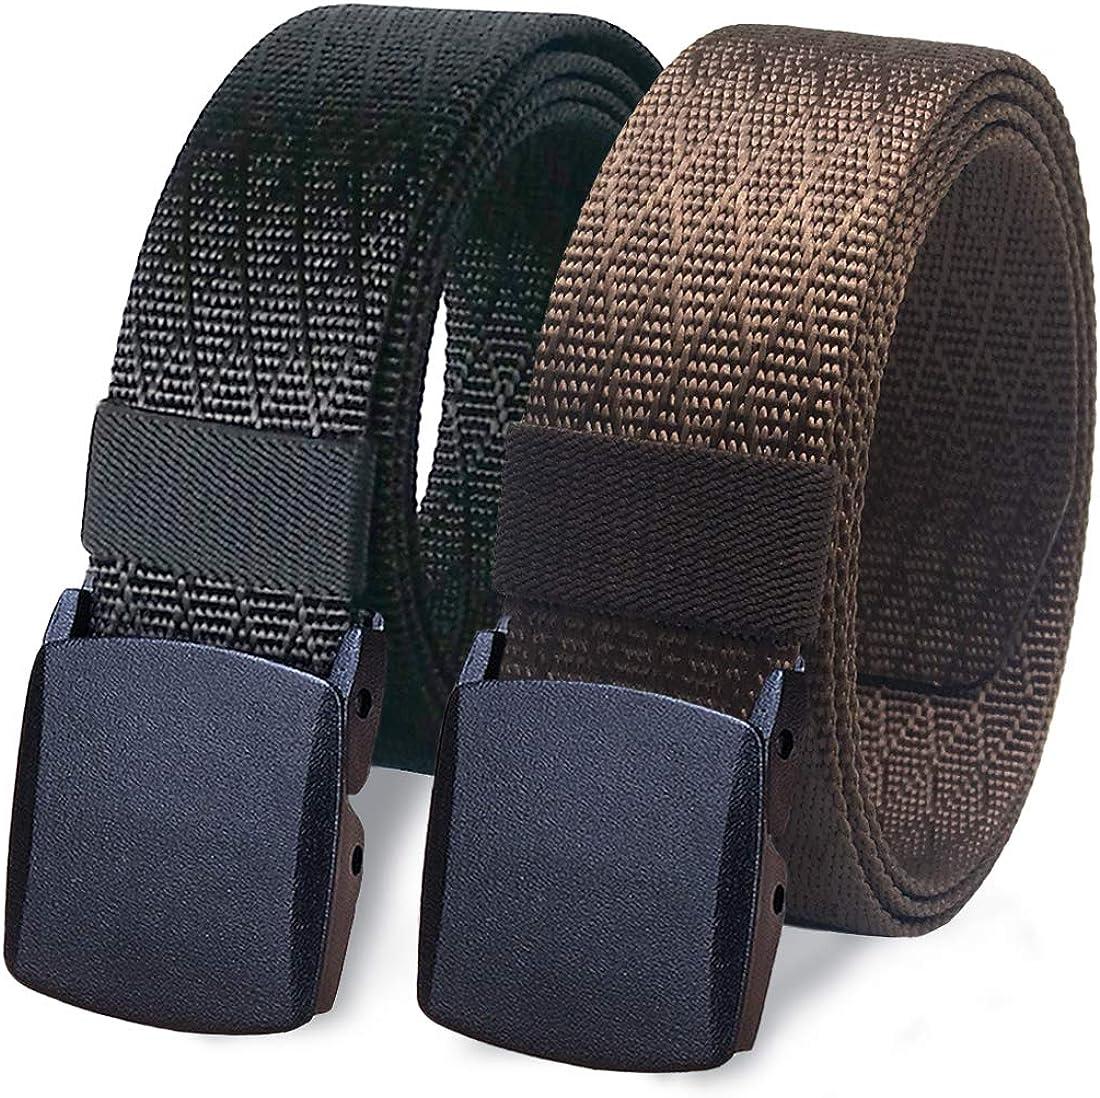 Men Outdoor Sports Military Tactical Nylon Waistband POM Buckle Belt